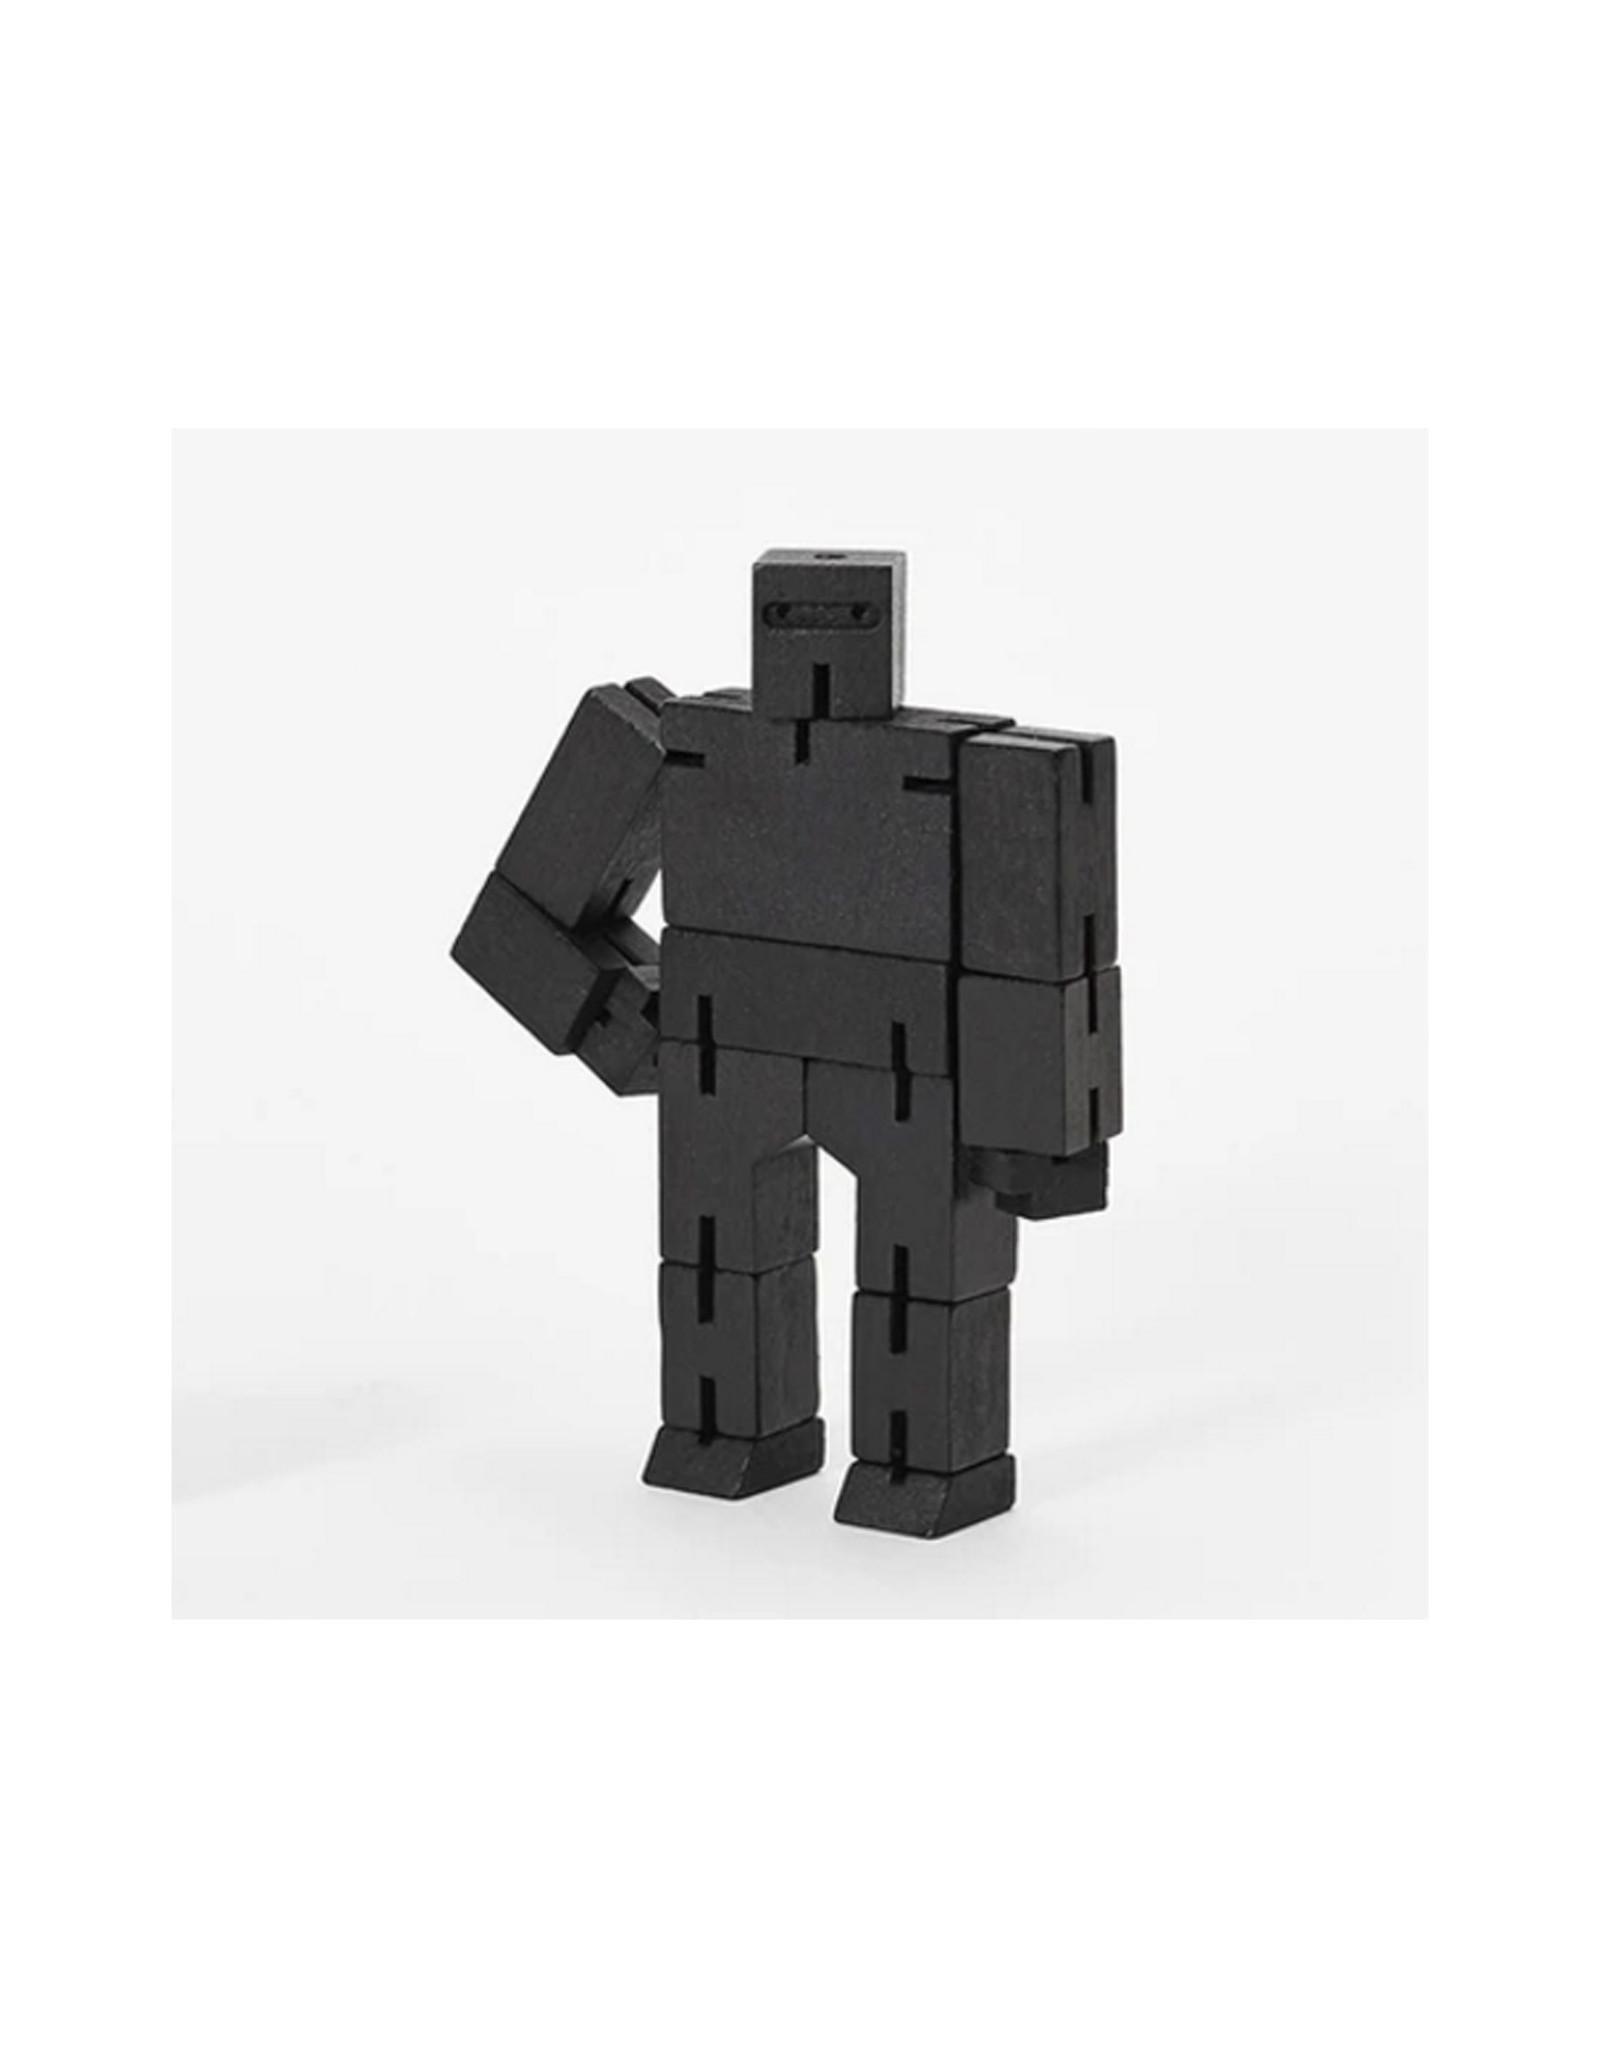 Cubebot Micro Ninja, Black